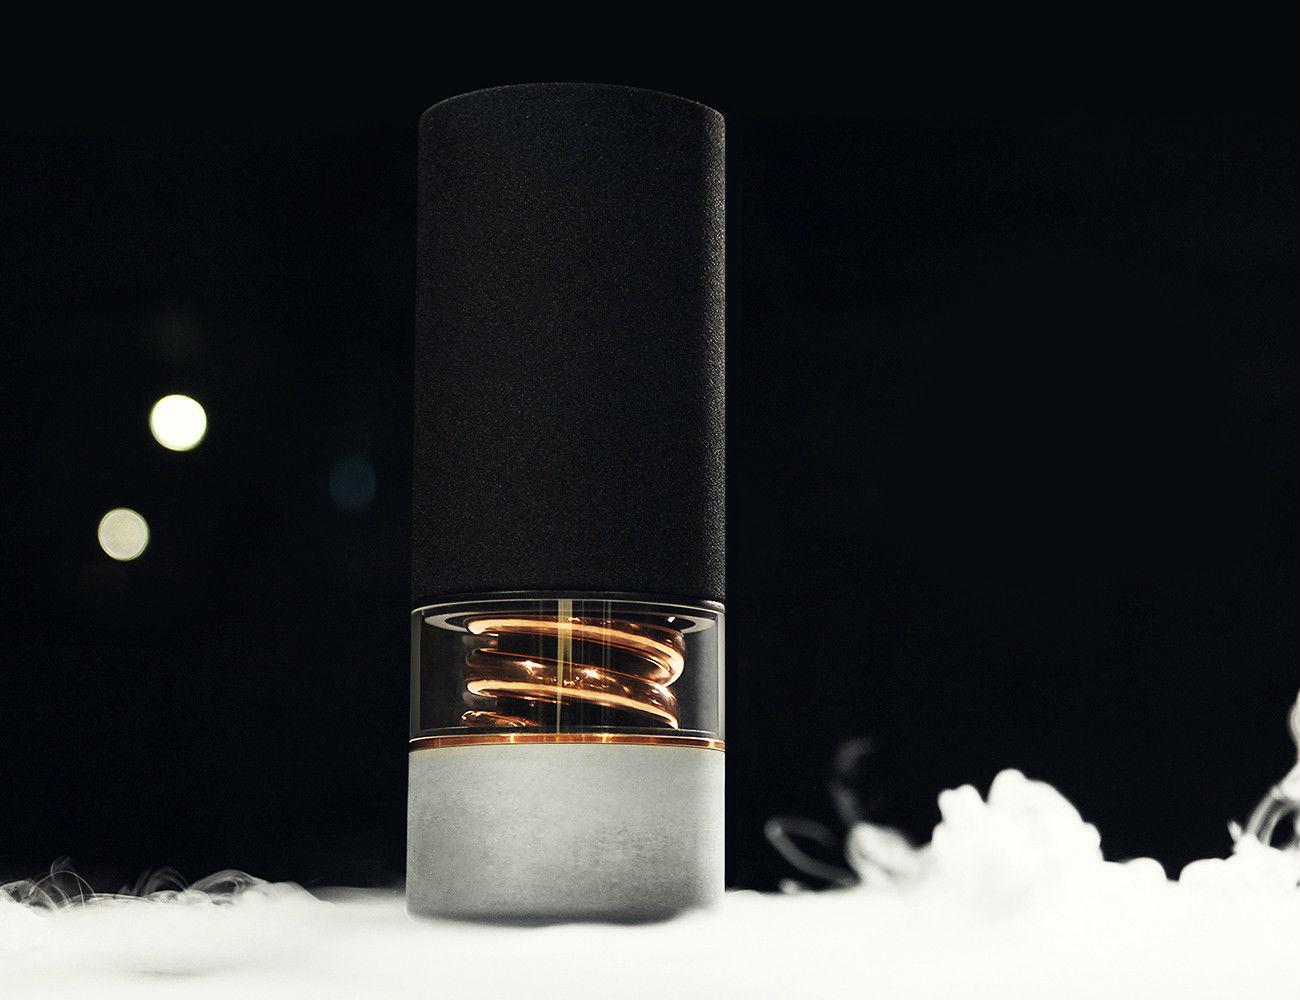 pavilion-wireless-speaker-01